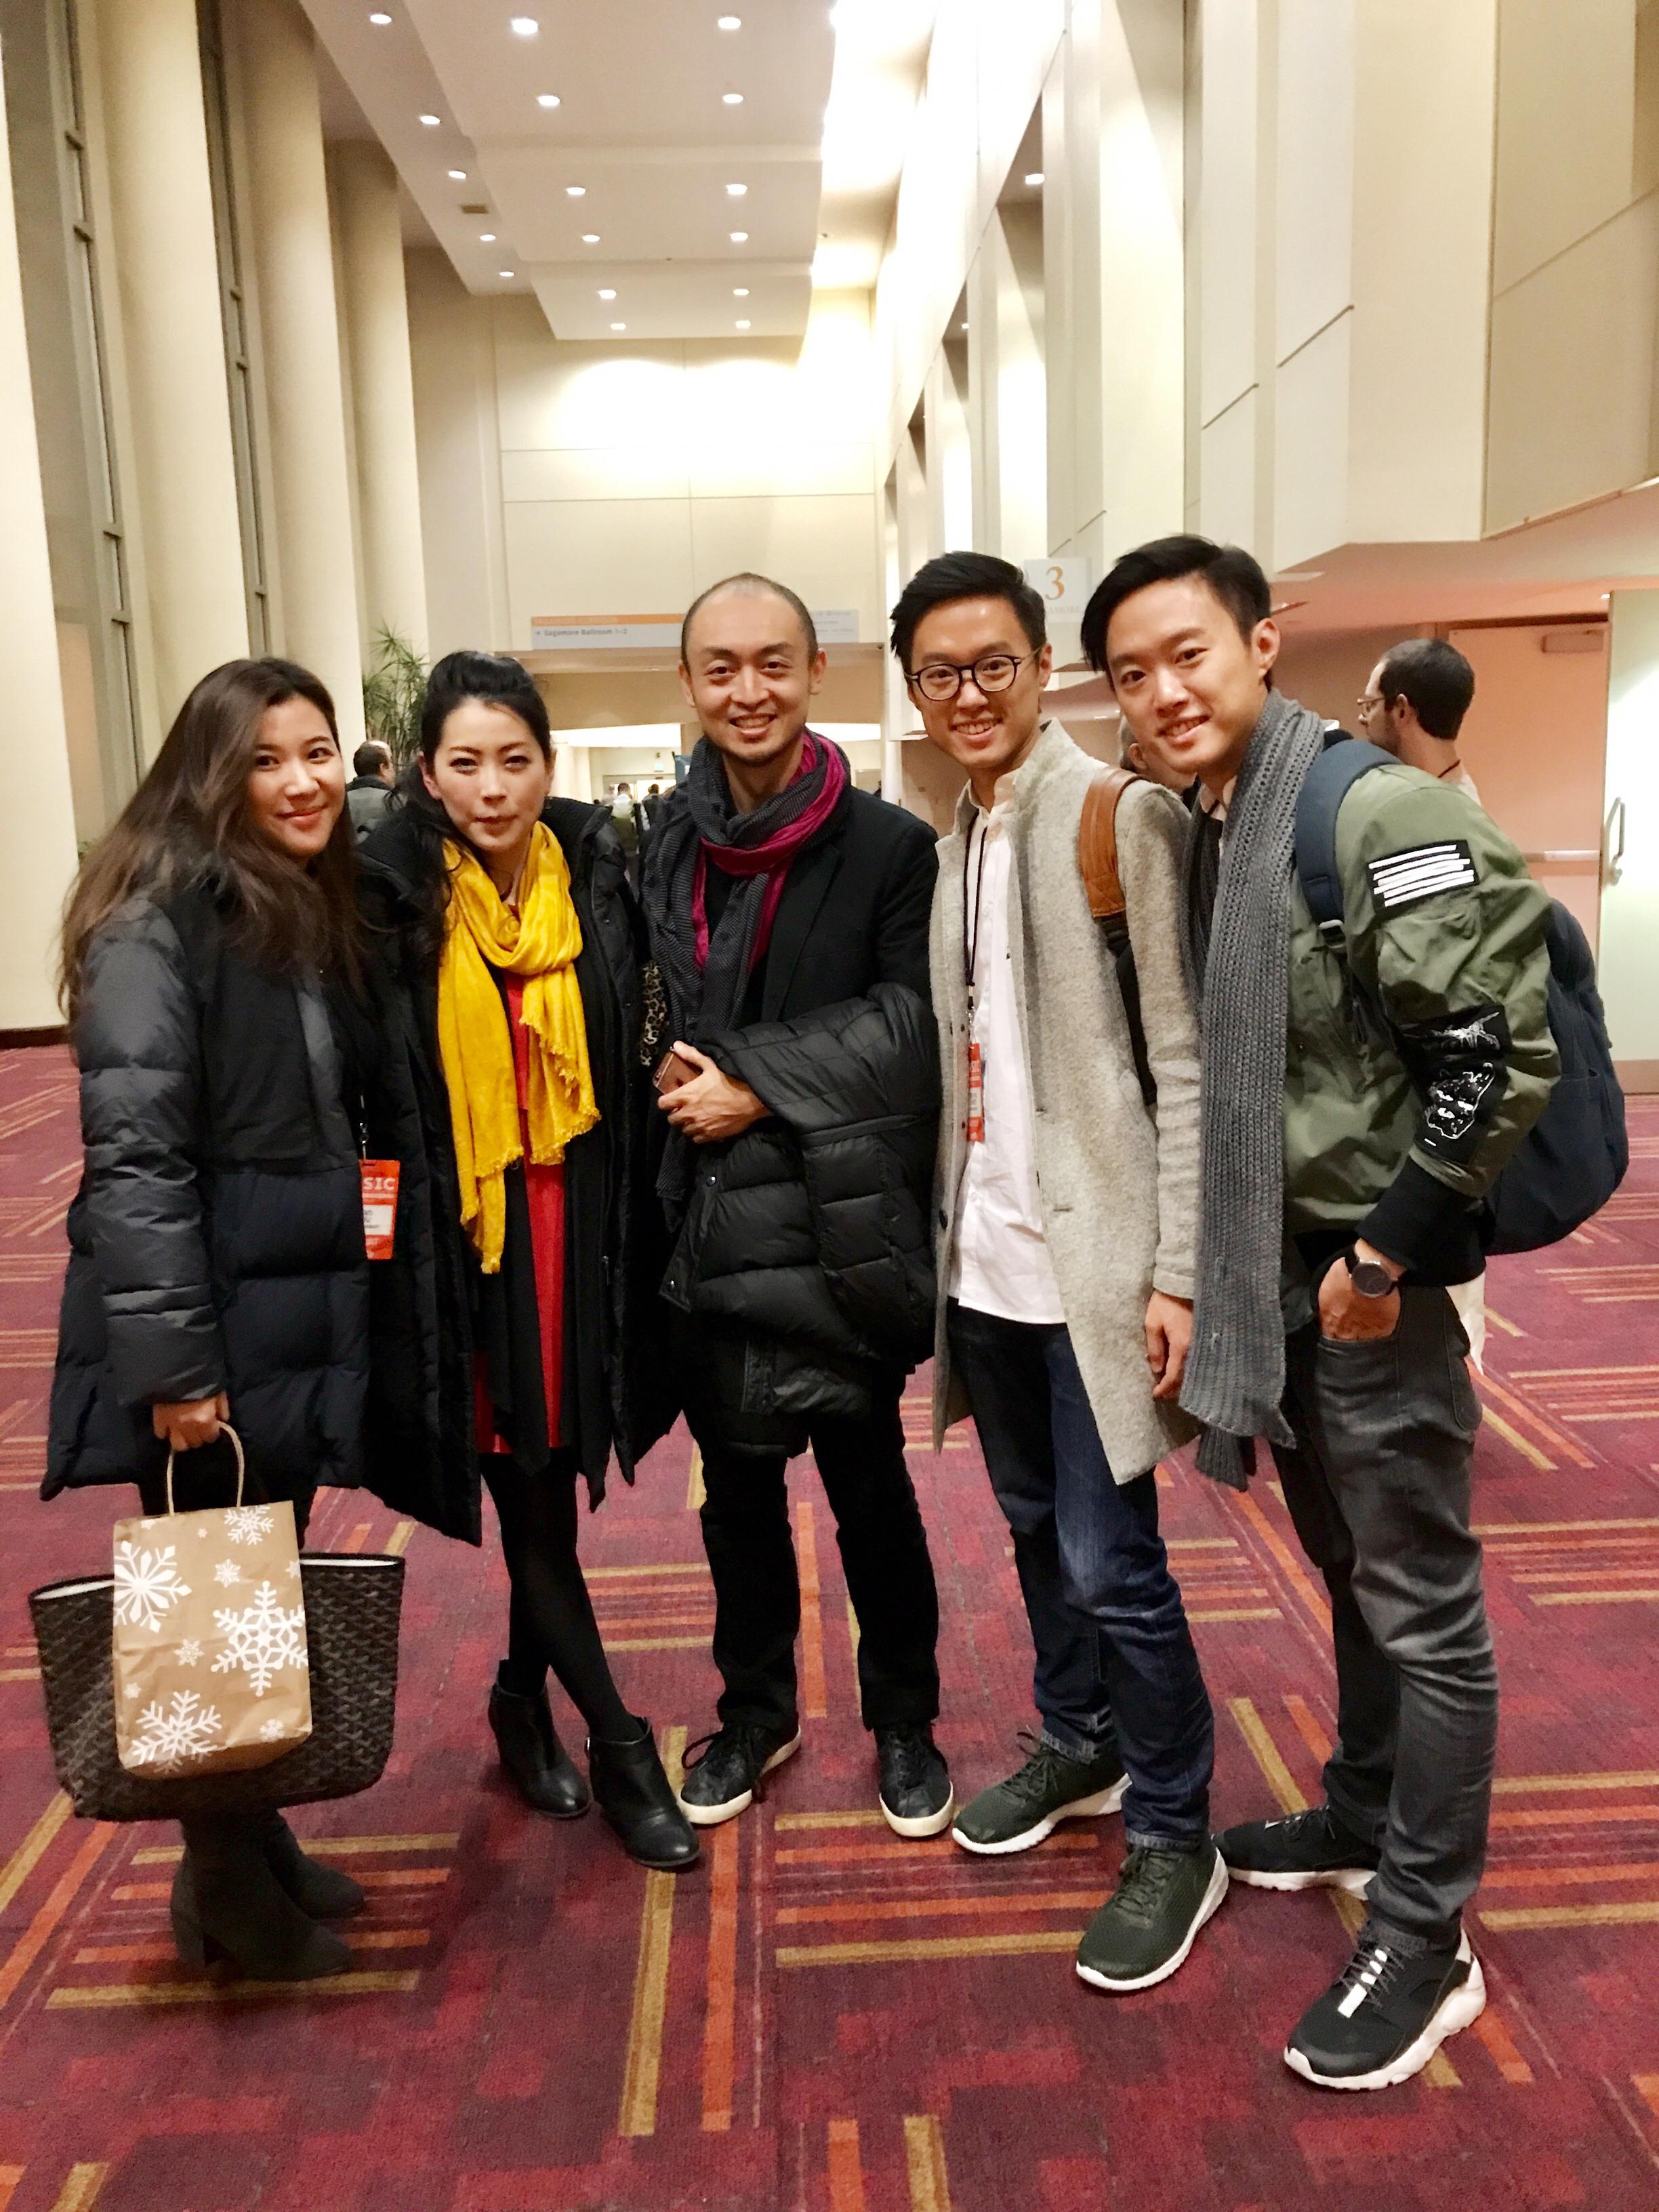 Eriko Daimo, Pius Chueng, Wu Yan, Twincussion